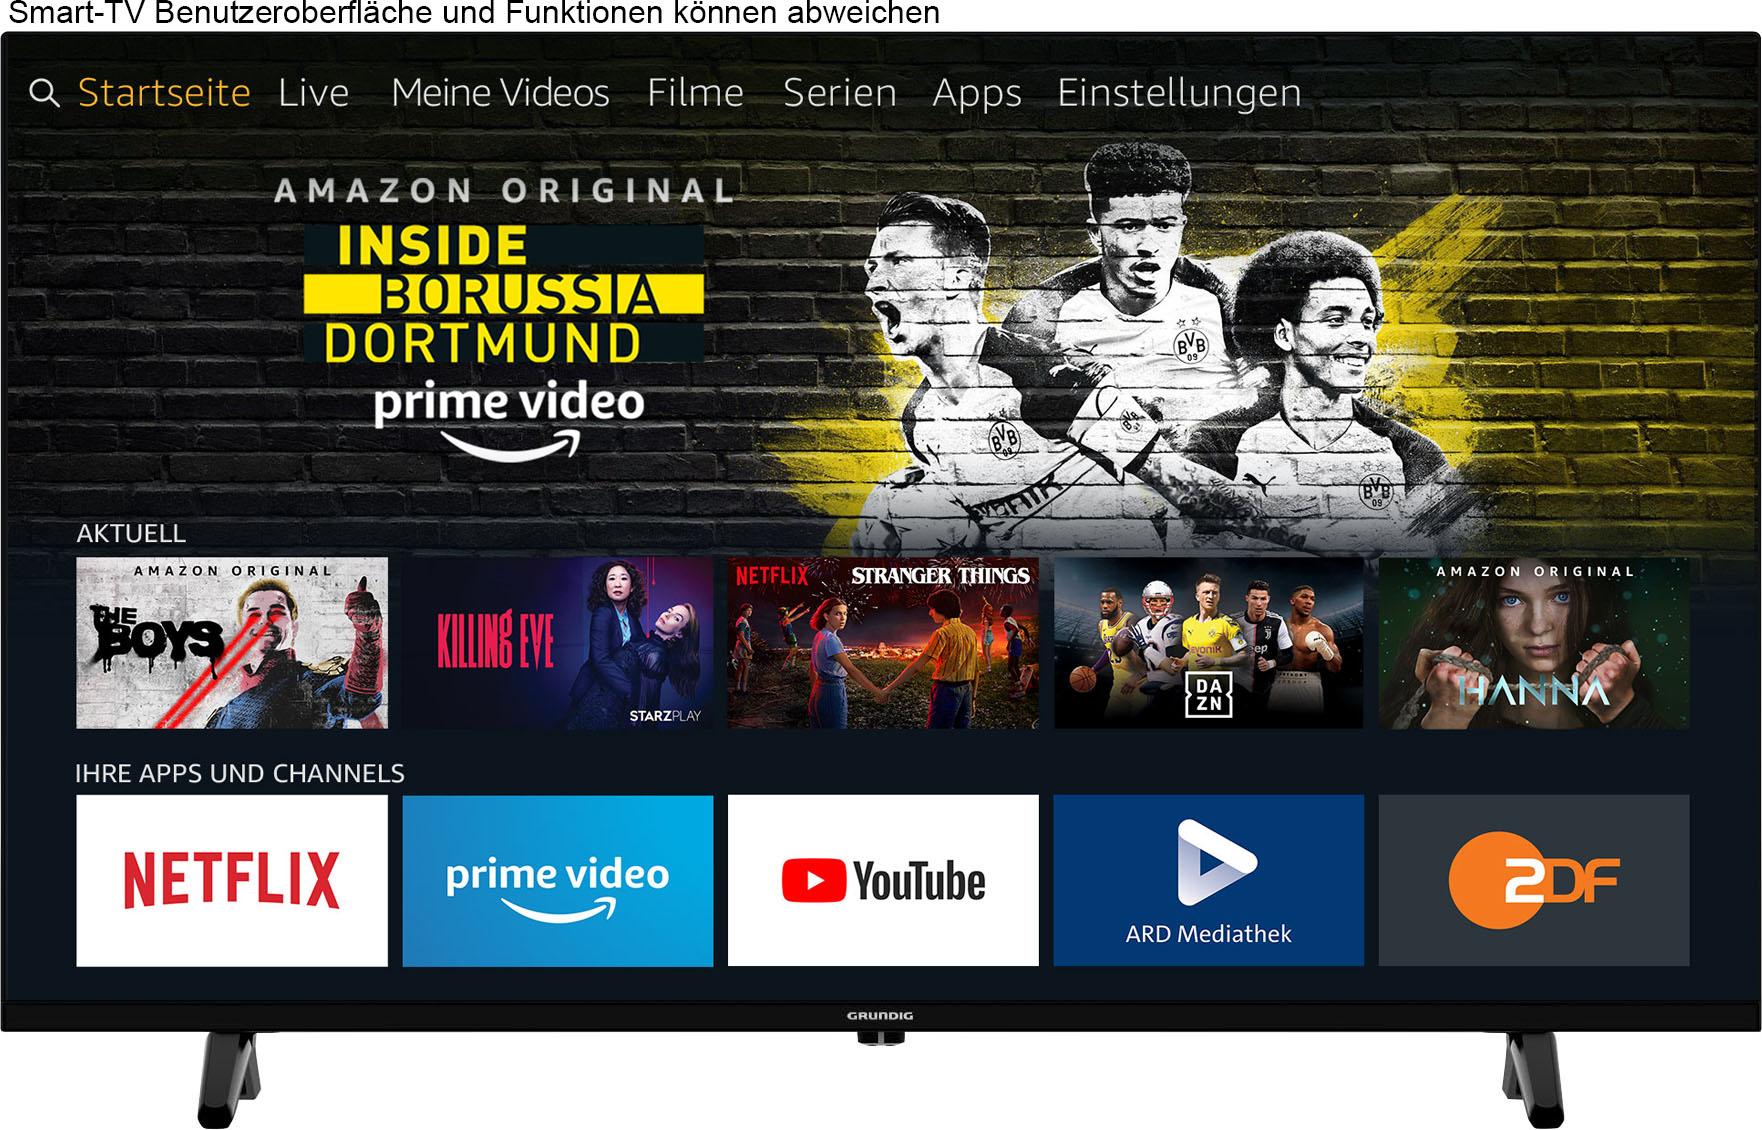 Grundig LED-Fernseher 43 VOE 61 Fire TV Edition TTF000 , 108 cm 43 , Full HD, Smart-TV